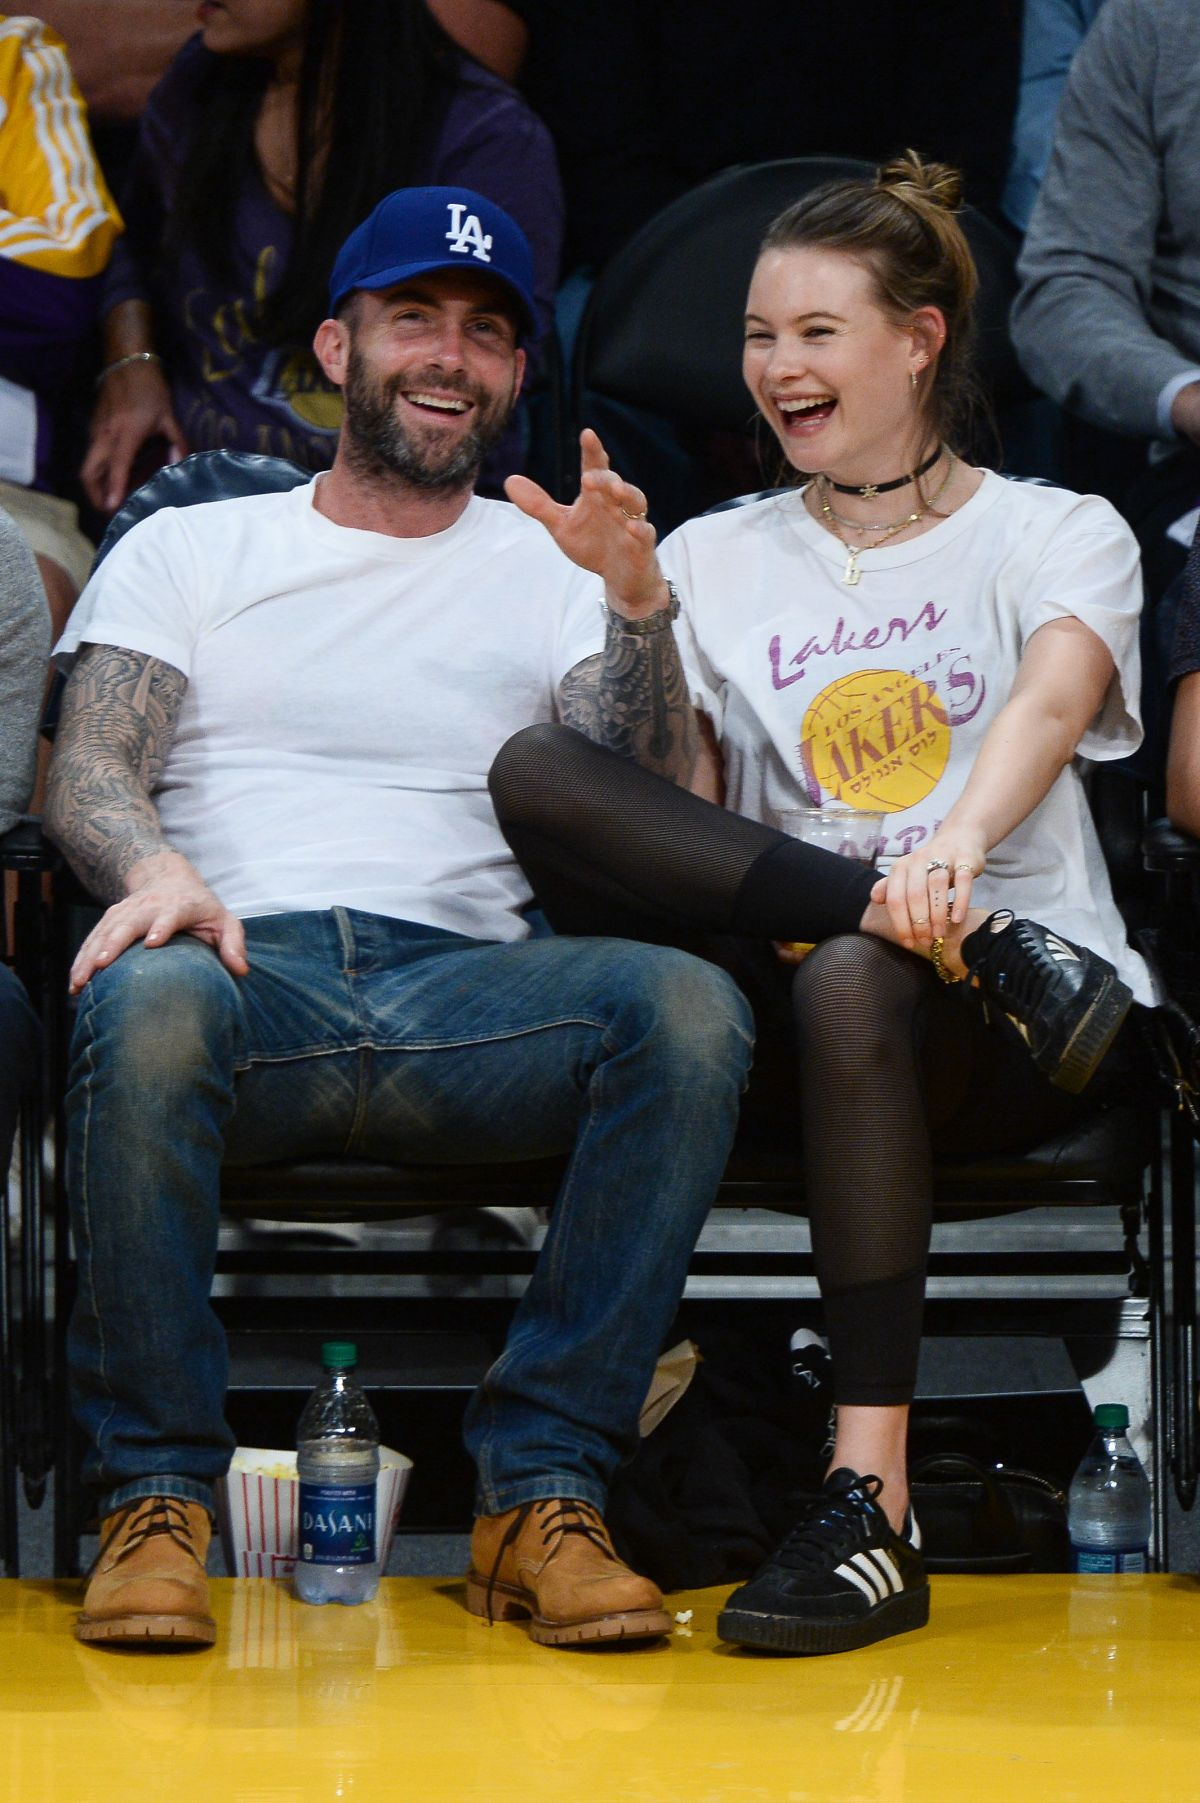 BEHATI PRINSLOO and Adam Levine at Lakers vs. Warriors Game in Los Angeles 11/25/2016